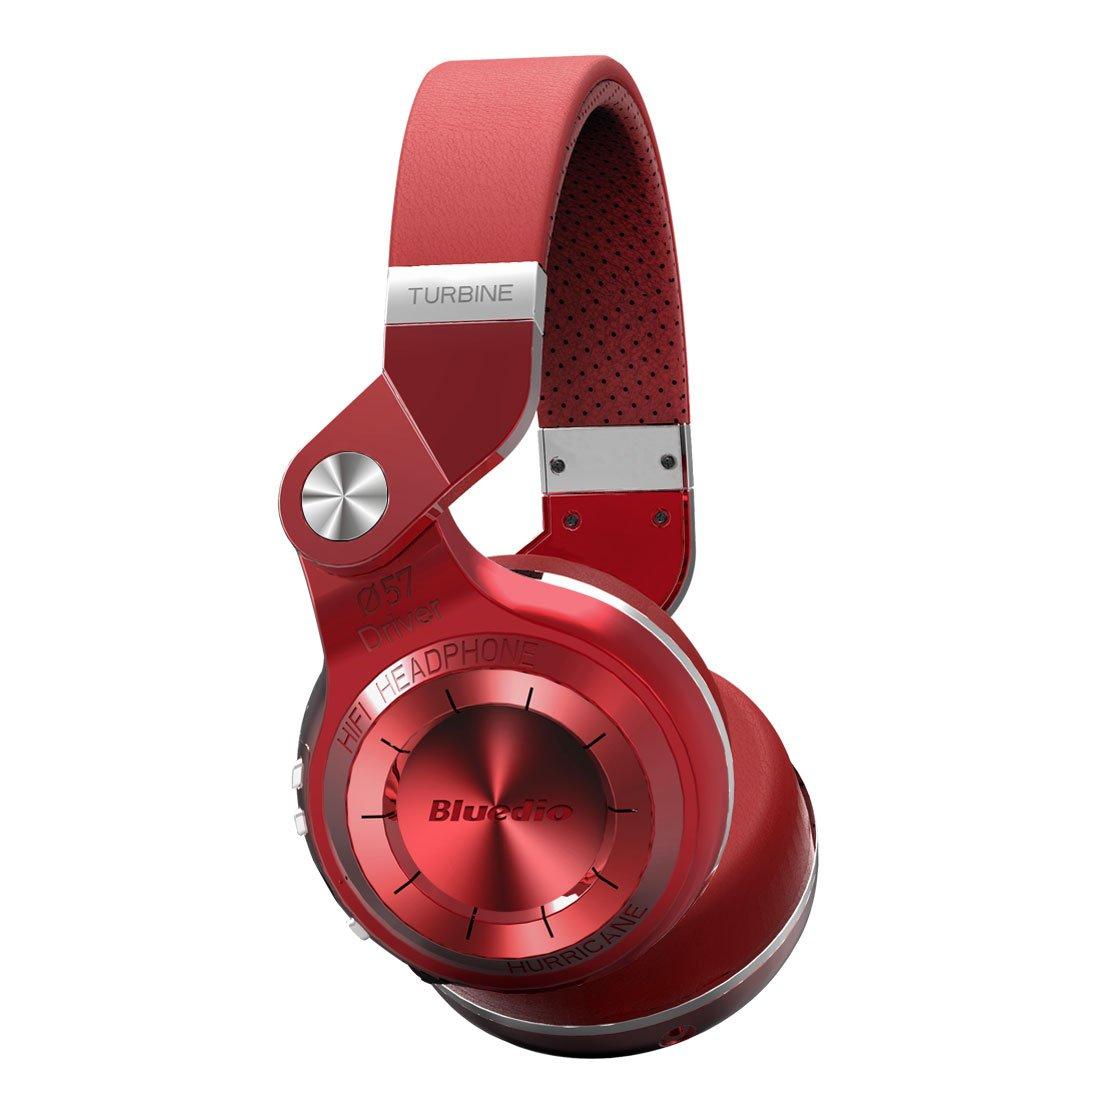 Bluedio T2 Plus Turbine Wireless Bluetooth Headphones with Mic/Micro SD Card Slot/FM Radio (Black) T2VBCA01